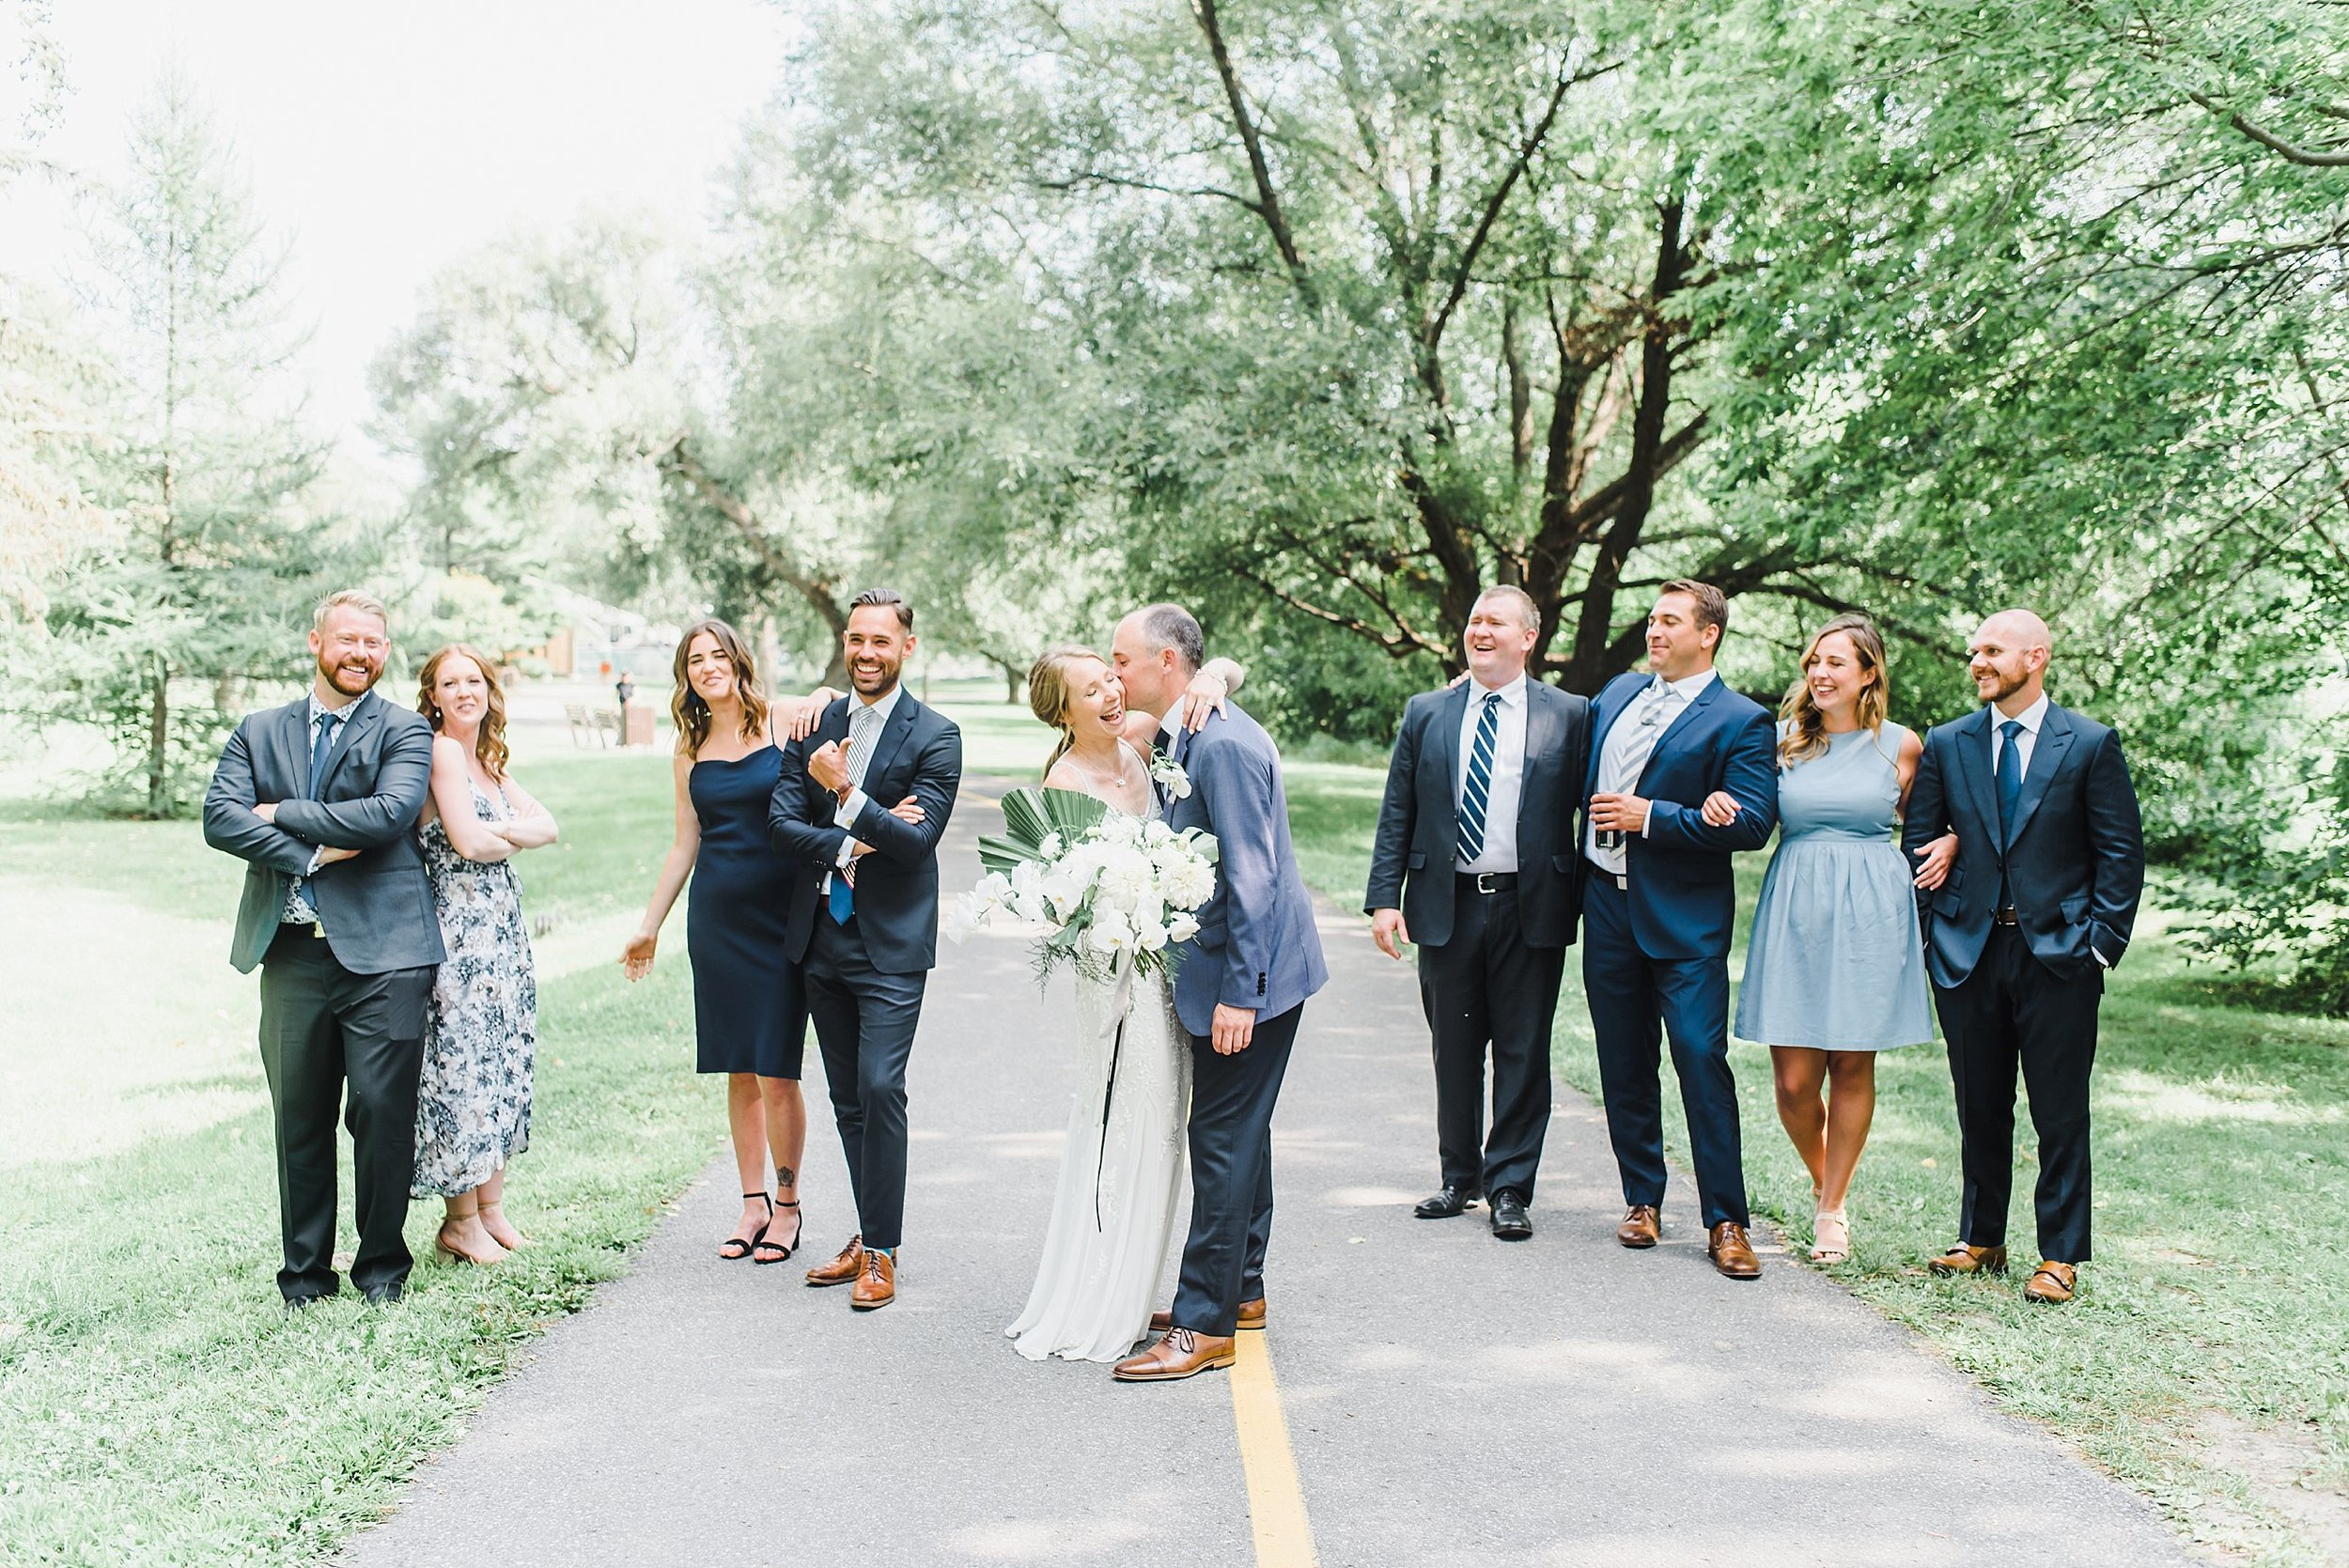 light airy indie fine art ottawa wedding photographer | Ali and Batoul Photography_0668.jpg